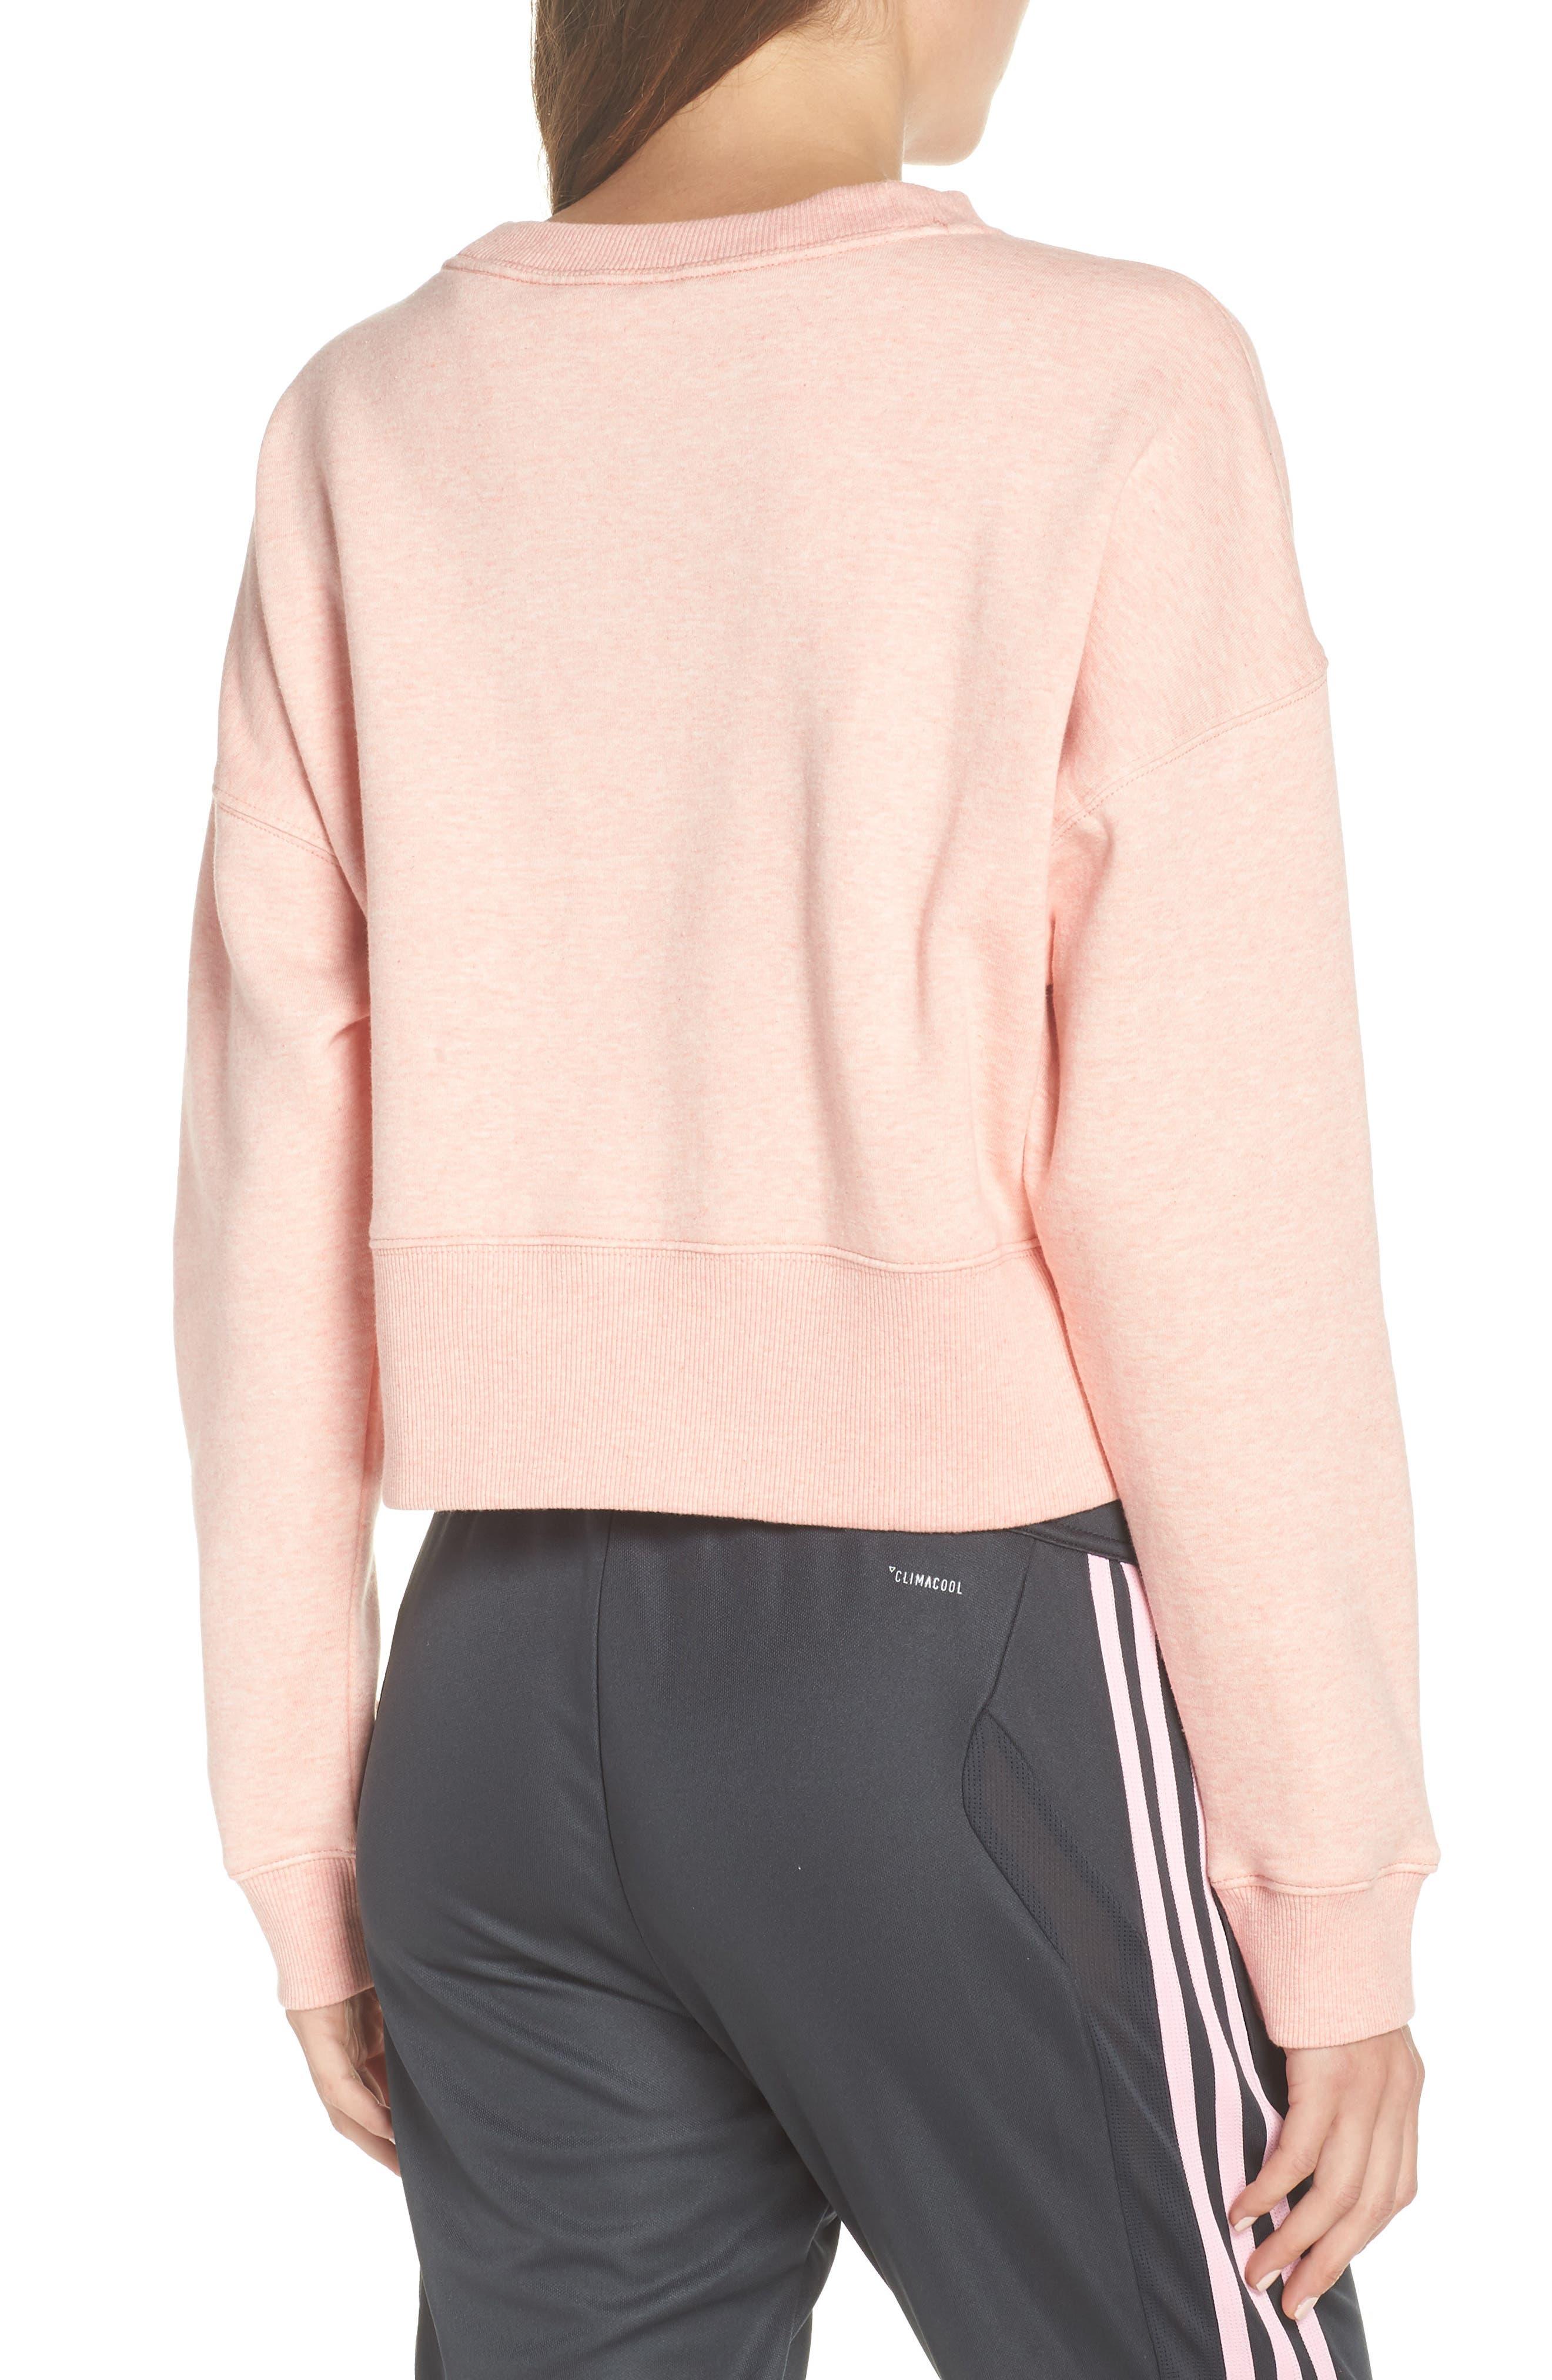 ADIDAS ORIGINALS, adidas Coeeze Crop Sweatshirt, Alternate thumbnail 2, color, 650